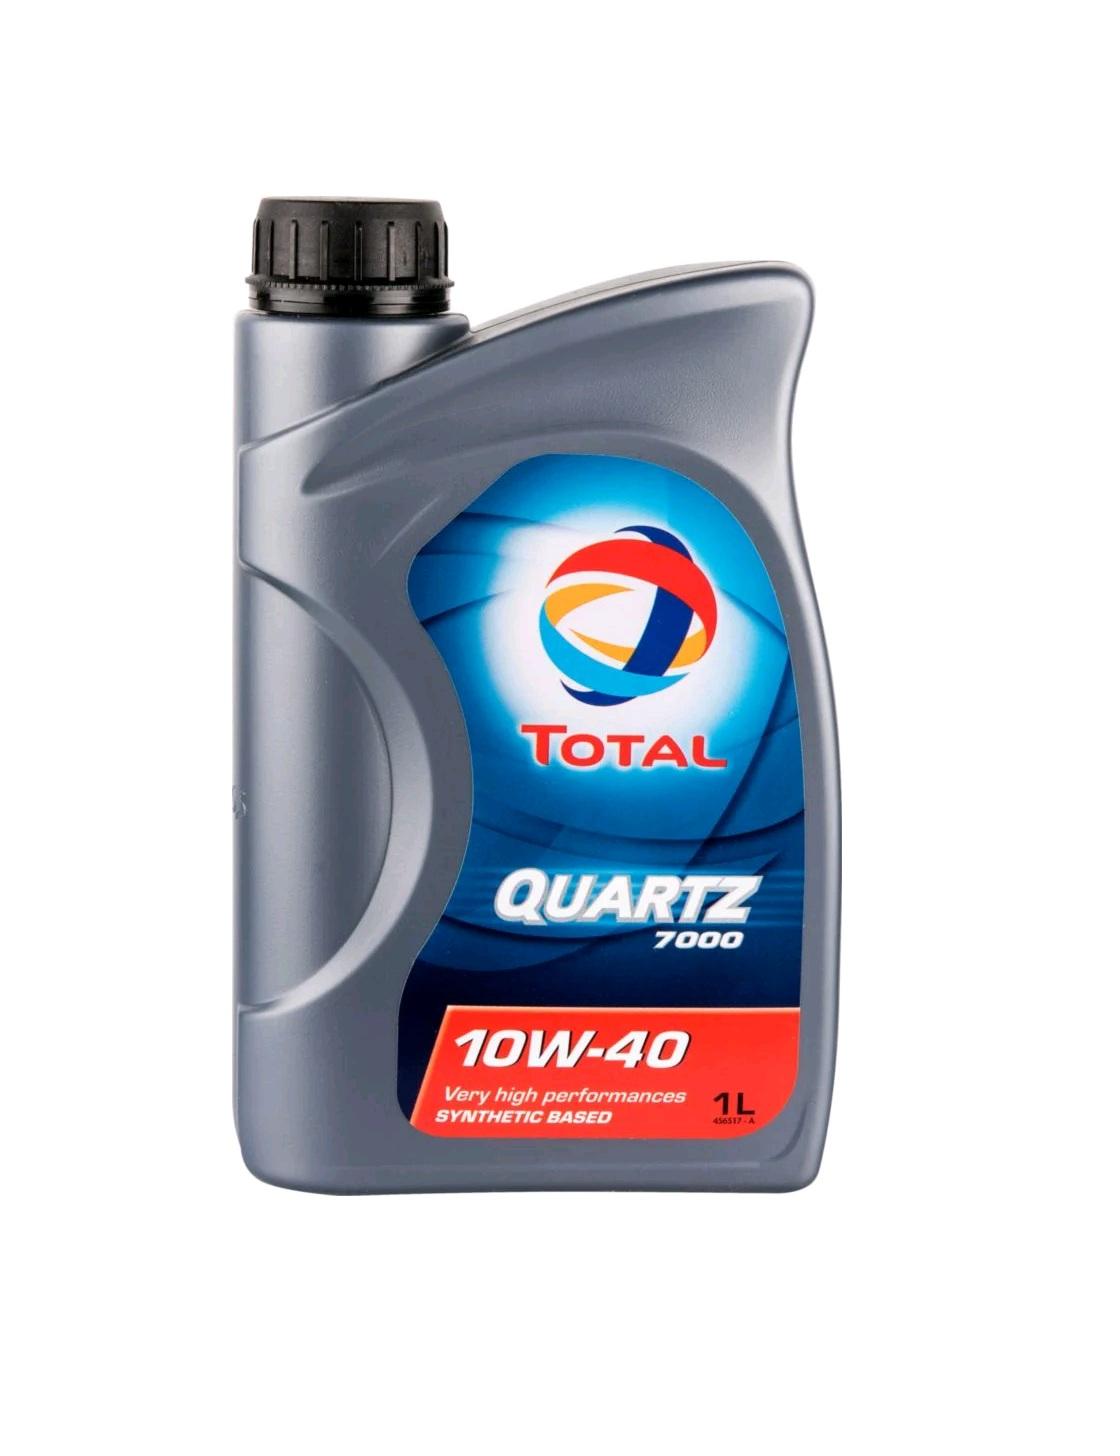 TOTAL QUARTZ 7000 10W-40 (1 л)